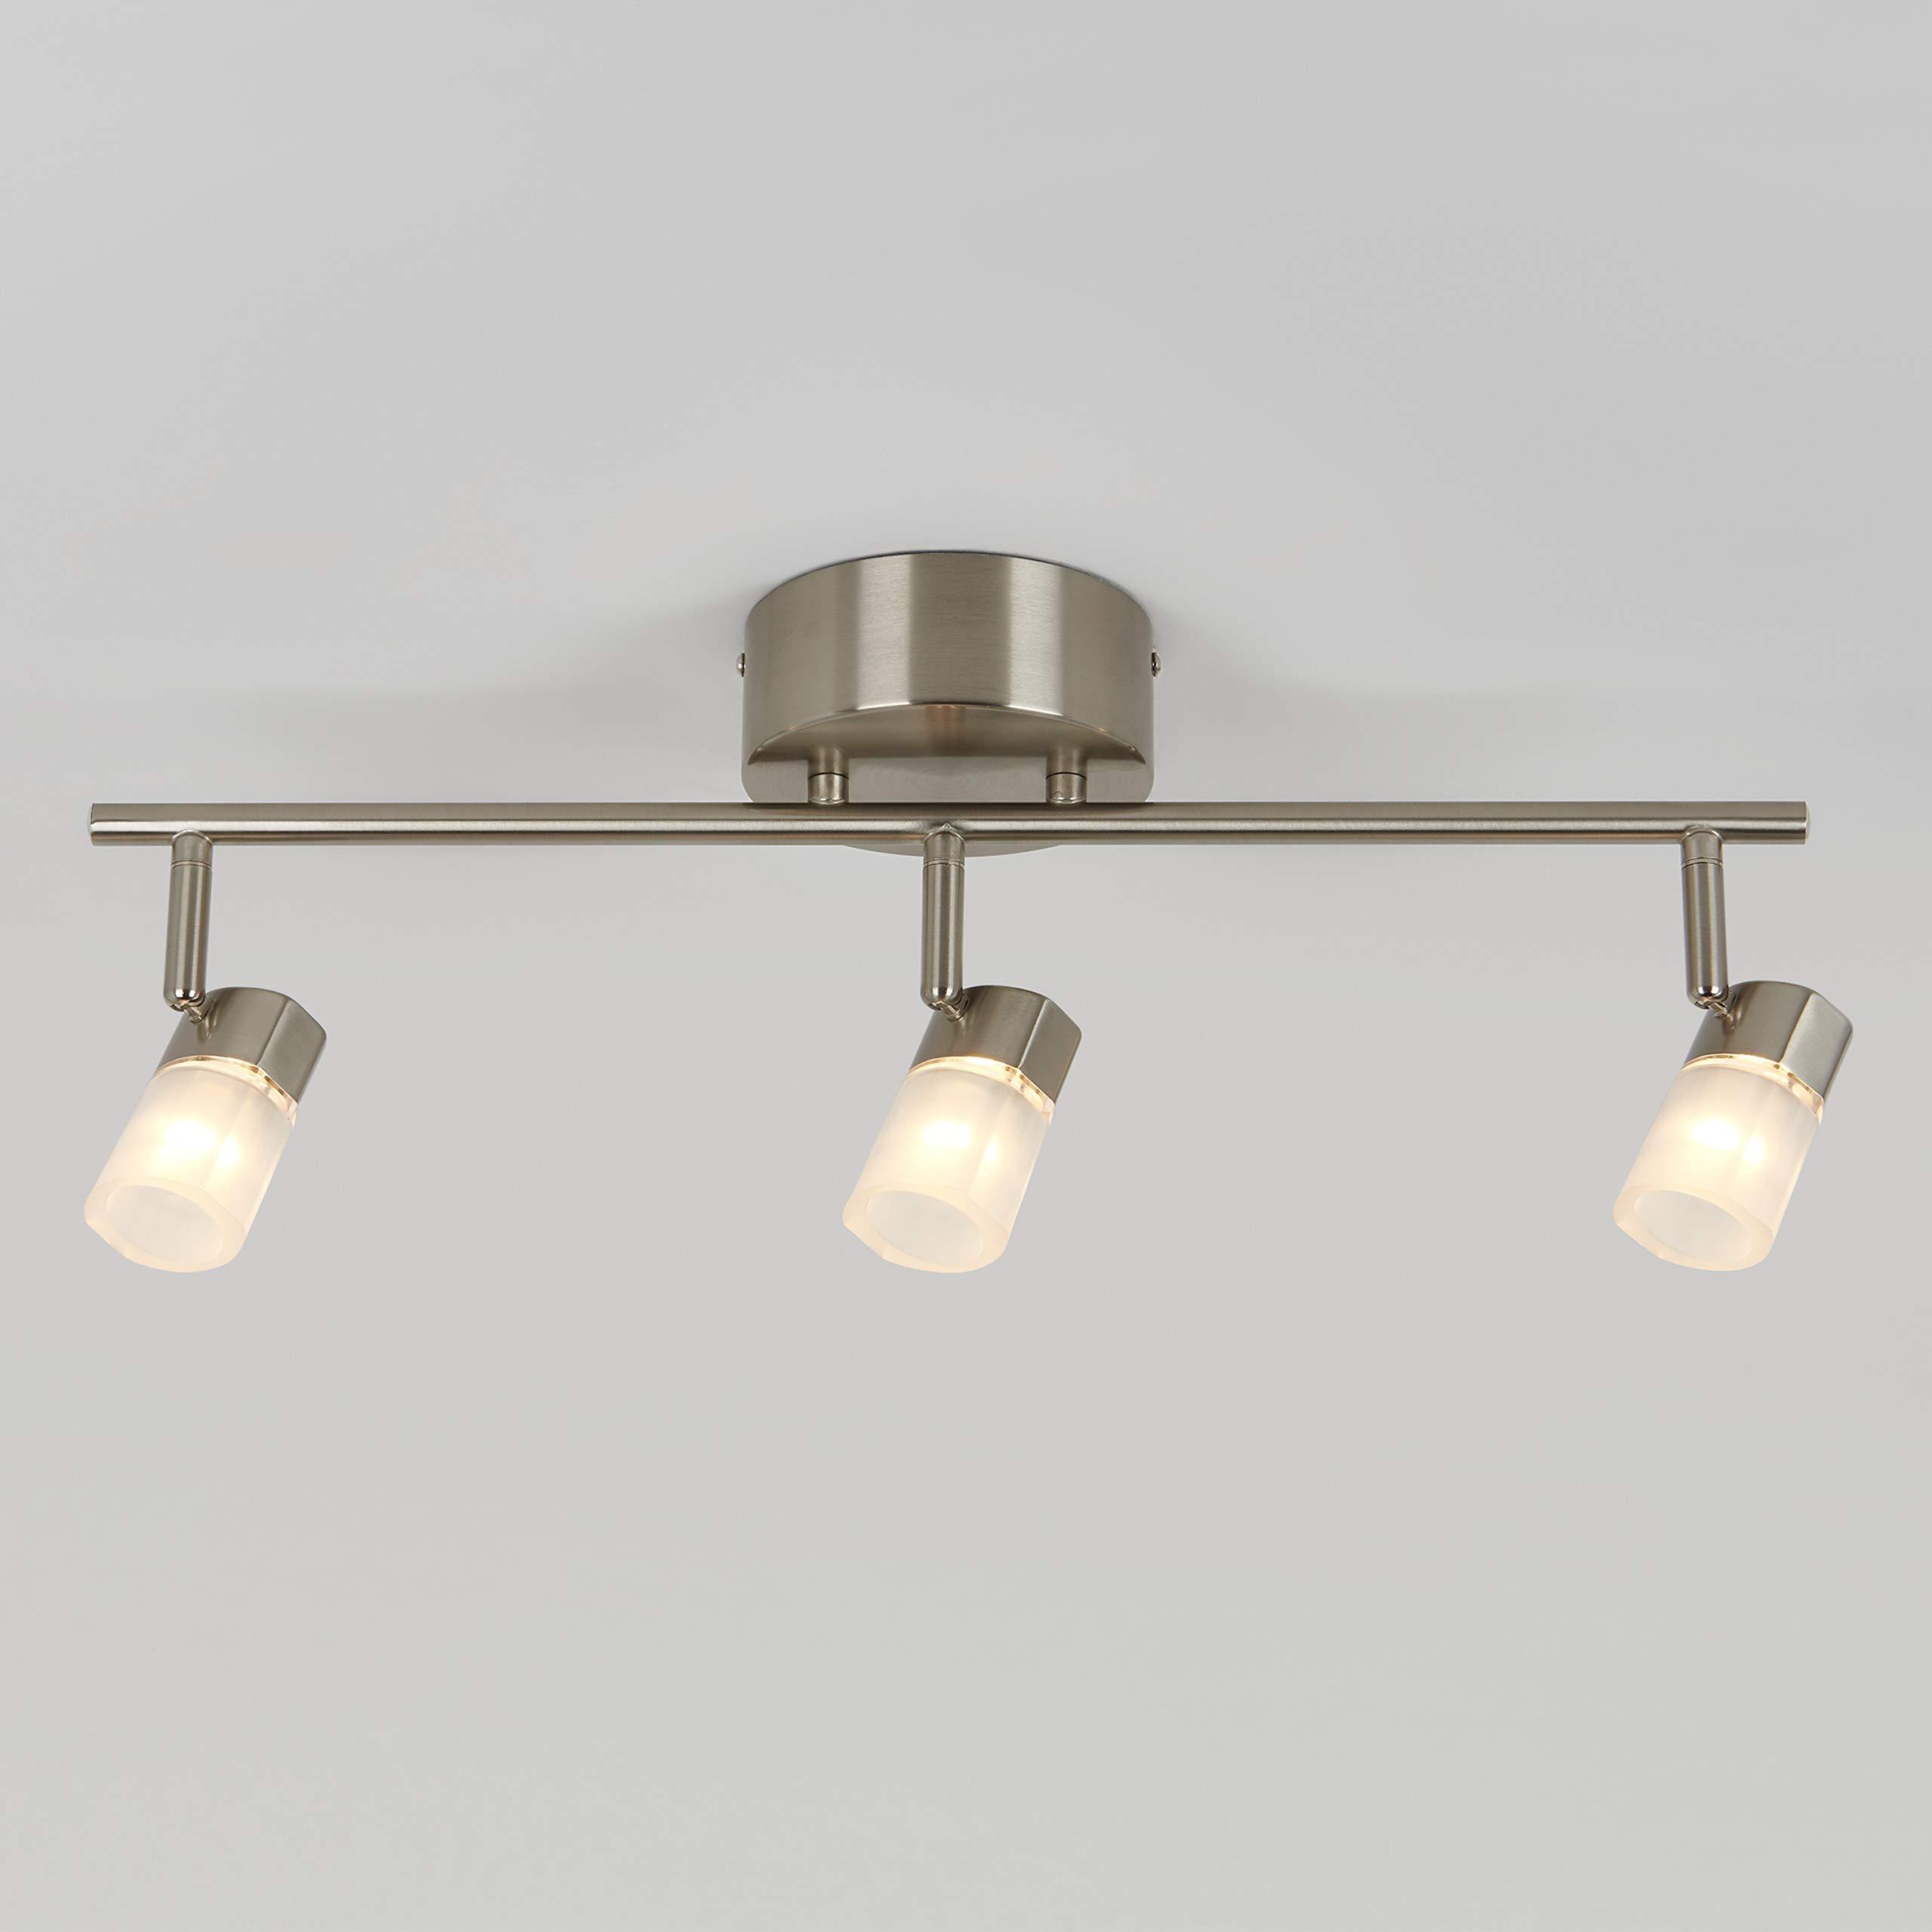 Artika 3-Light Vars Integrated LED Track Light (Silver) $30 at Home Depot + FS on $45+